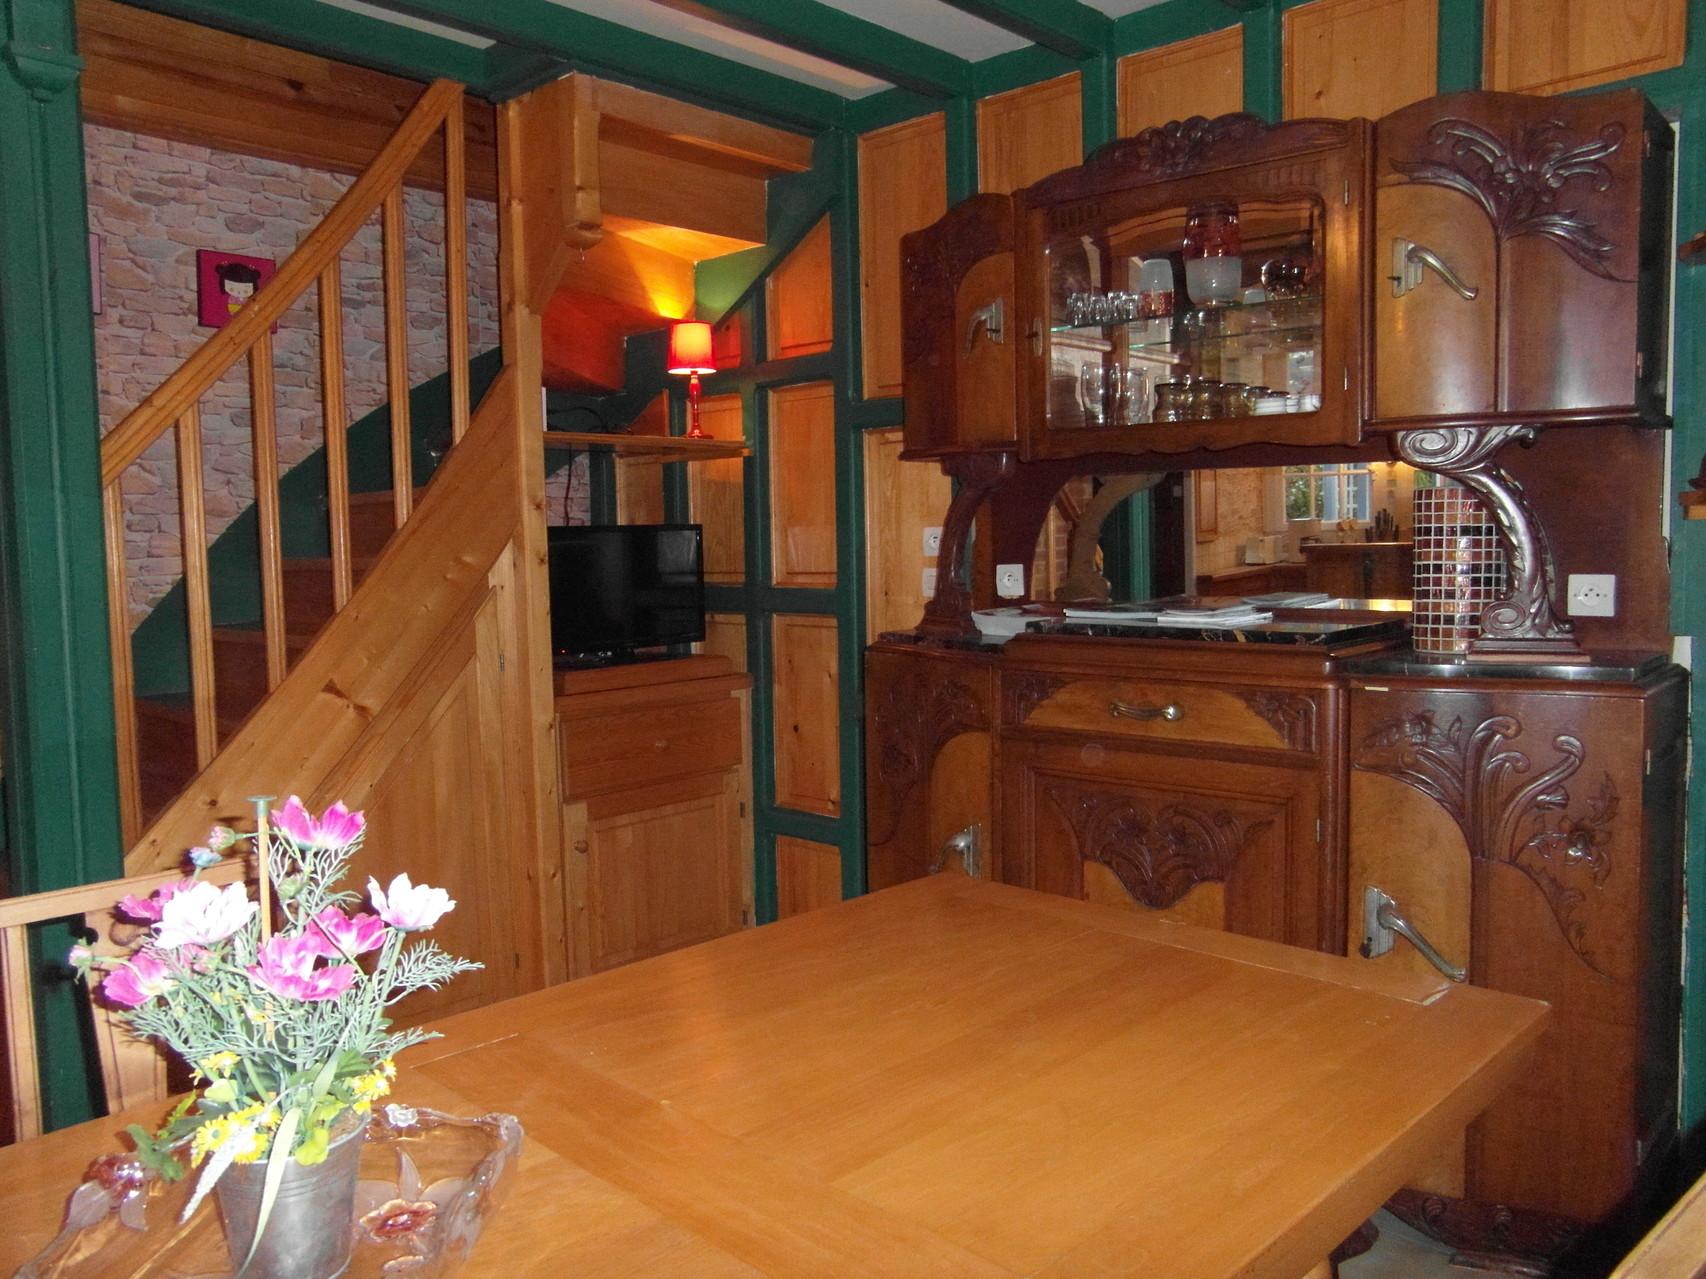 la salle (style chalet en bois)